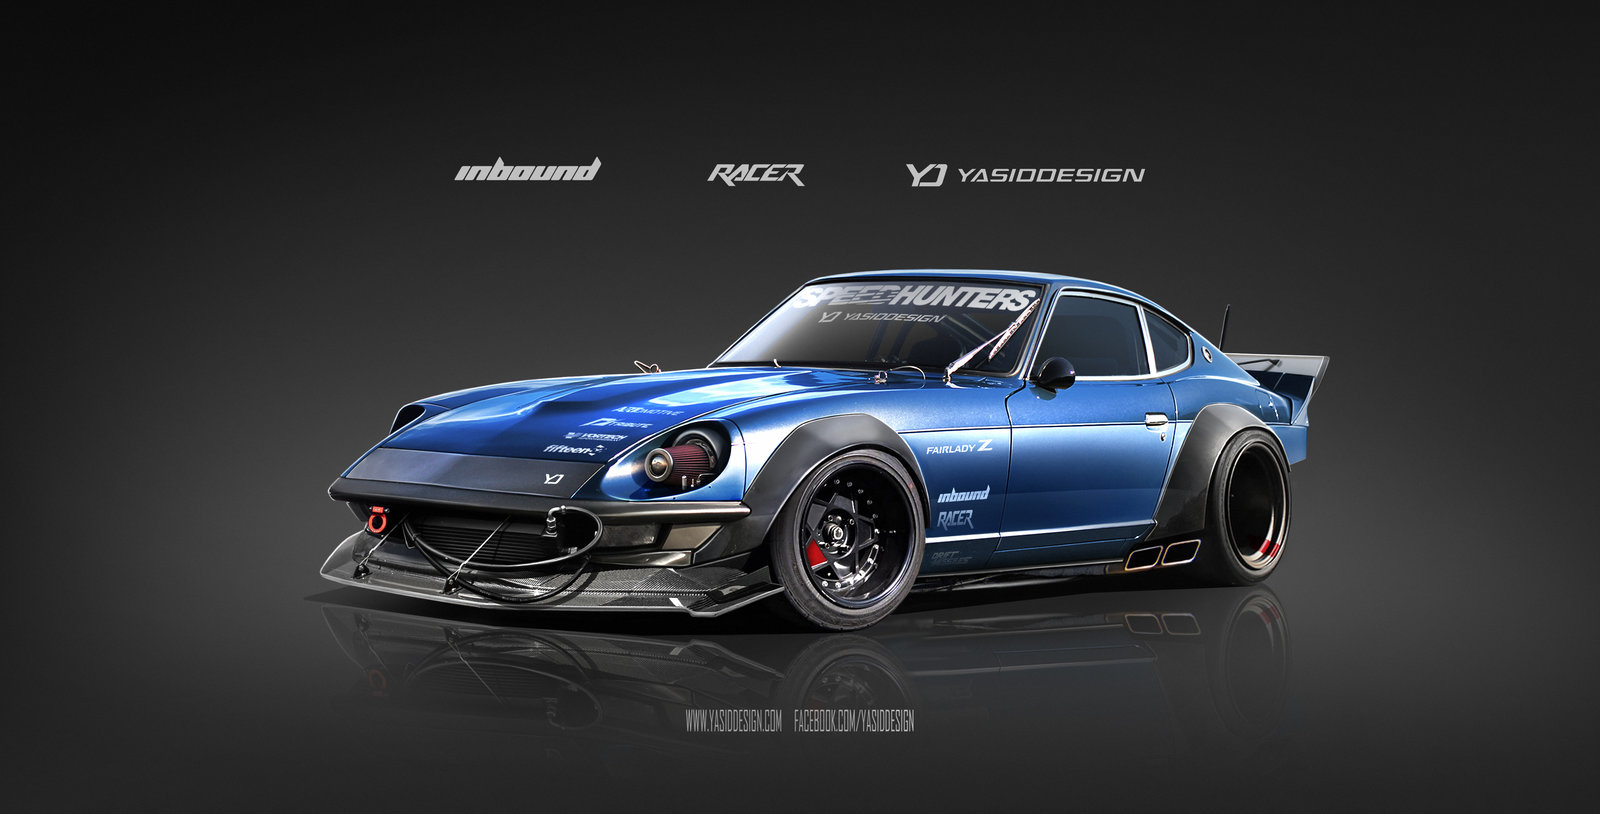 Inbound Racer 240Z Datsun Nissan